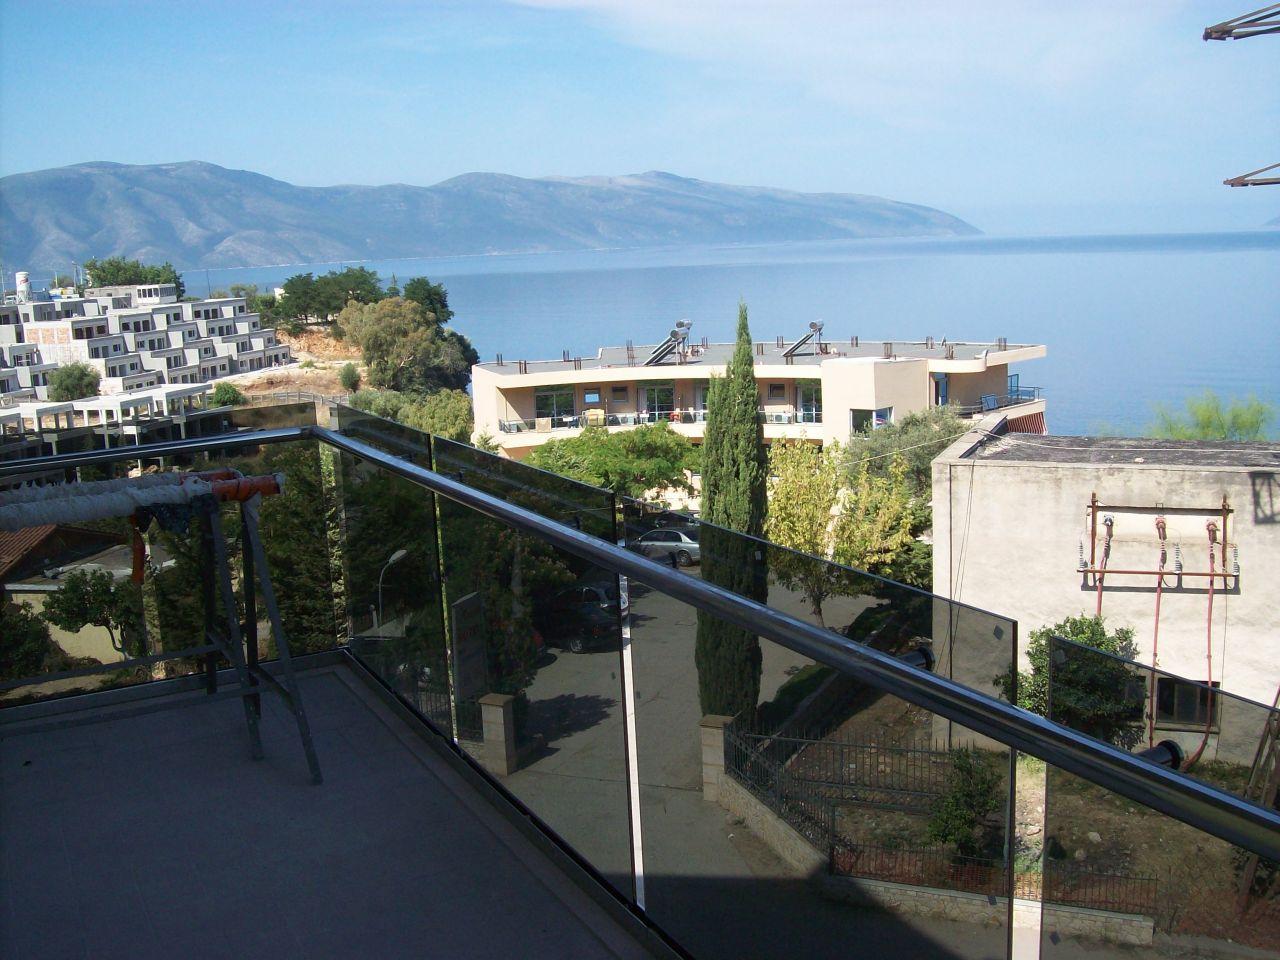 5 Vlore, Albania